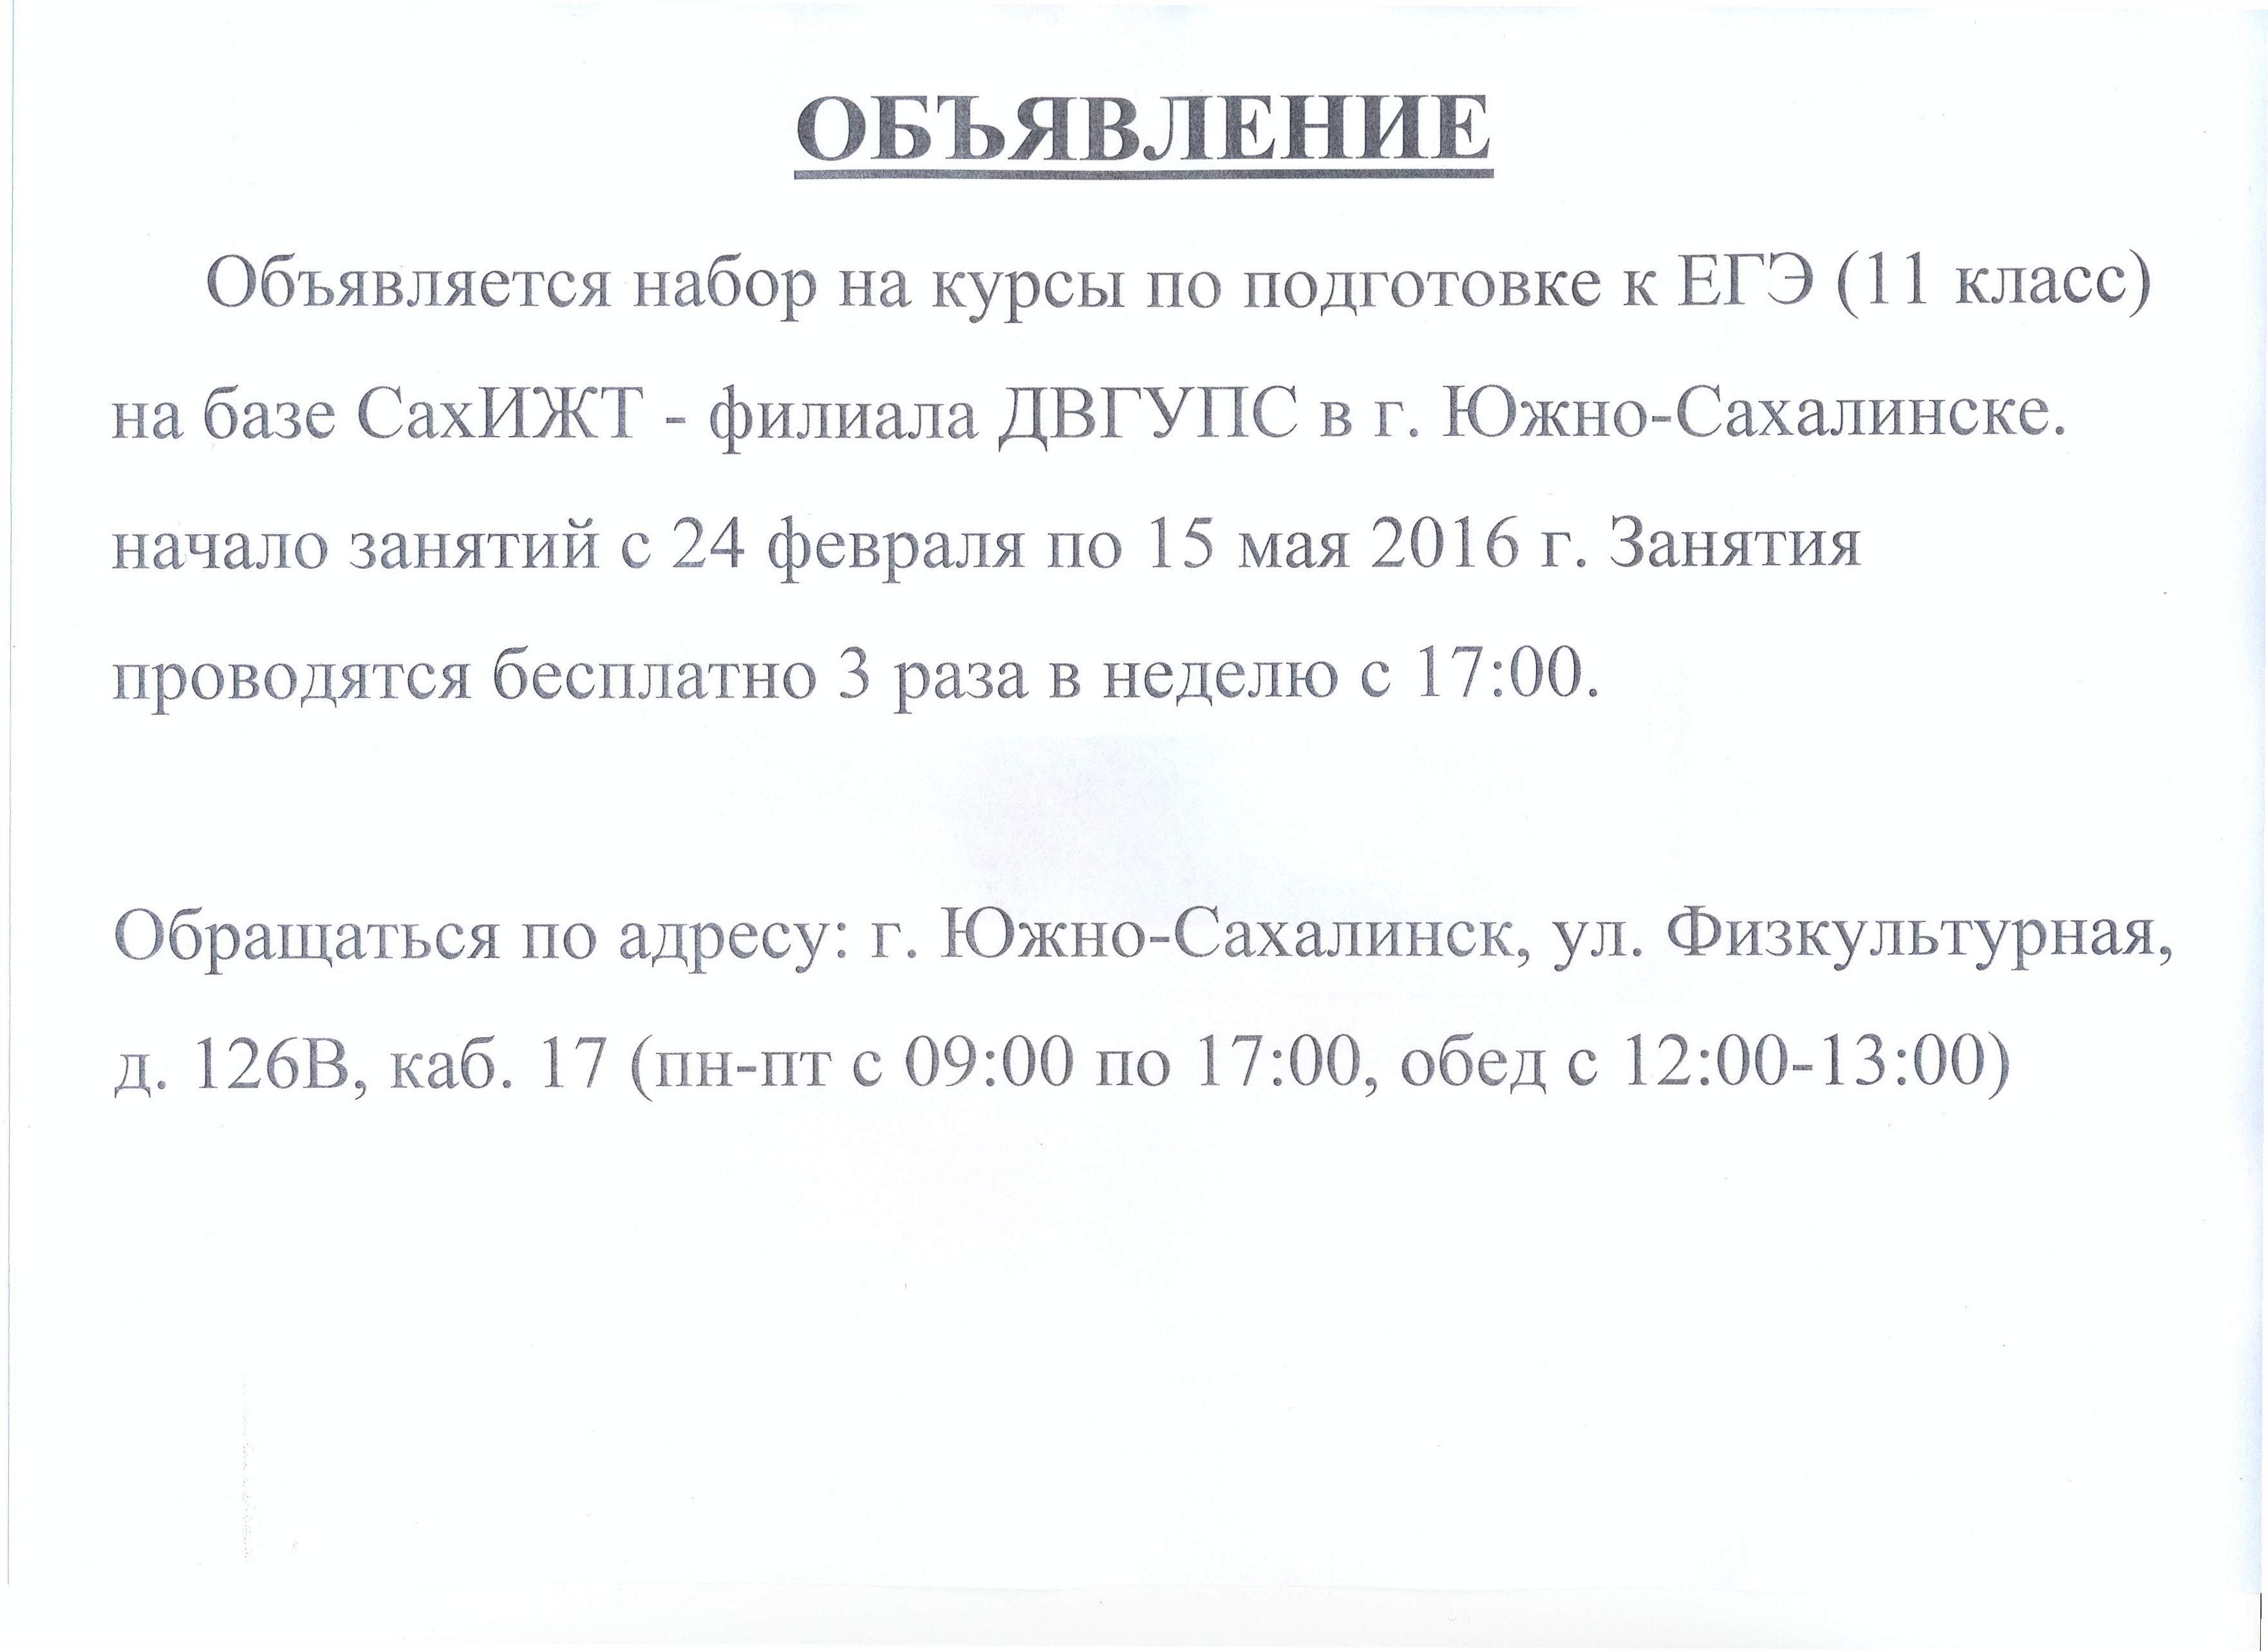 Школьнику выпускнику